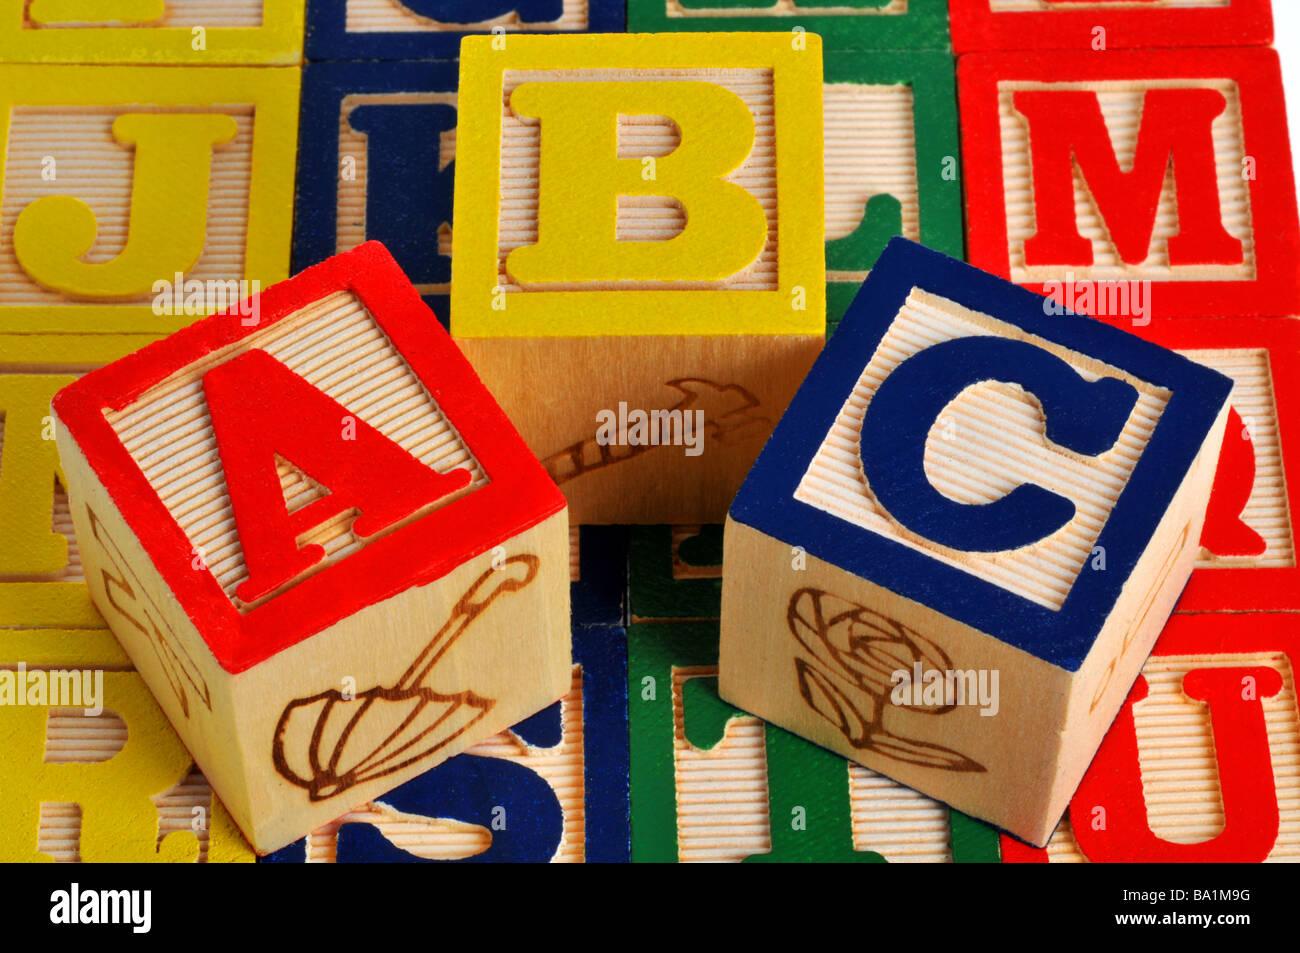 ABC wooden alphabet blocks - Stock Image